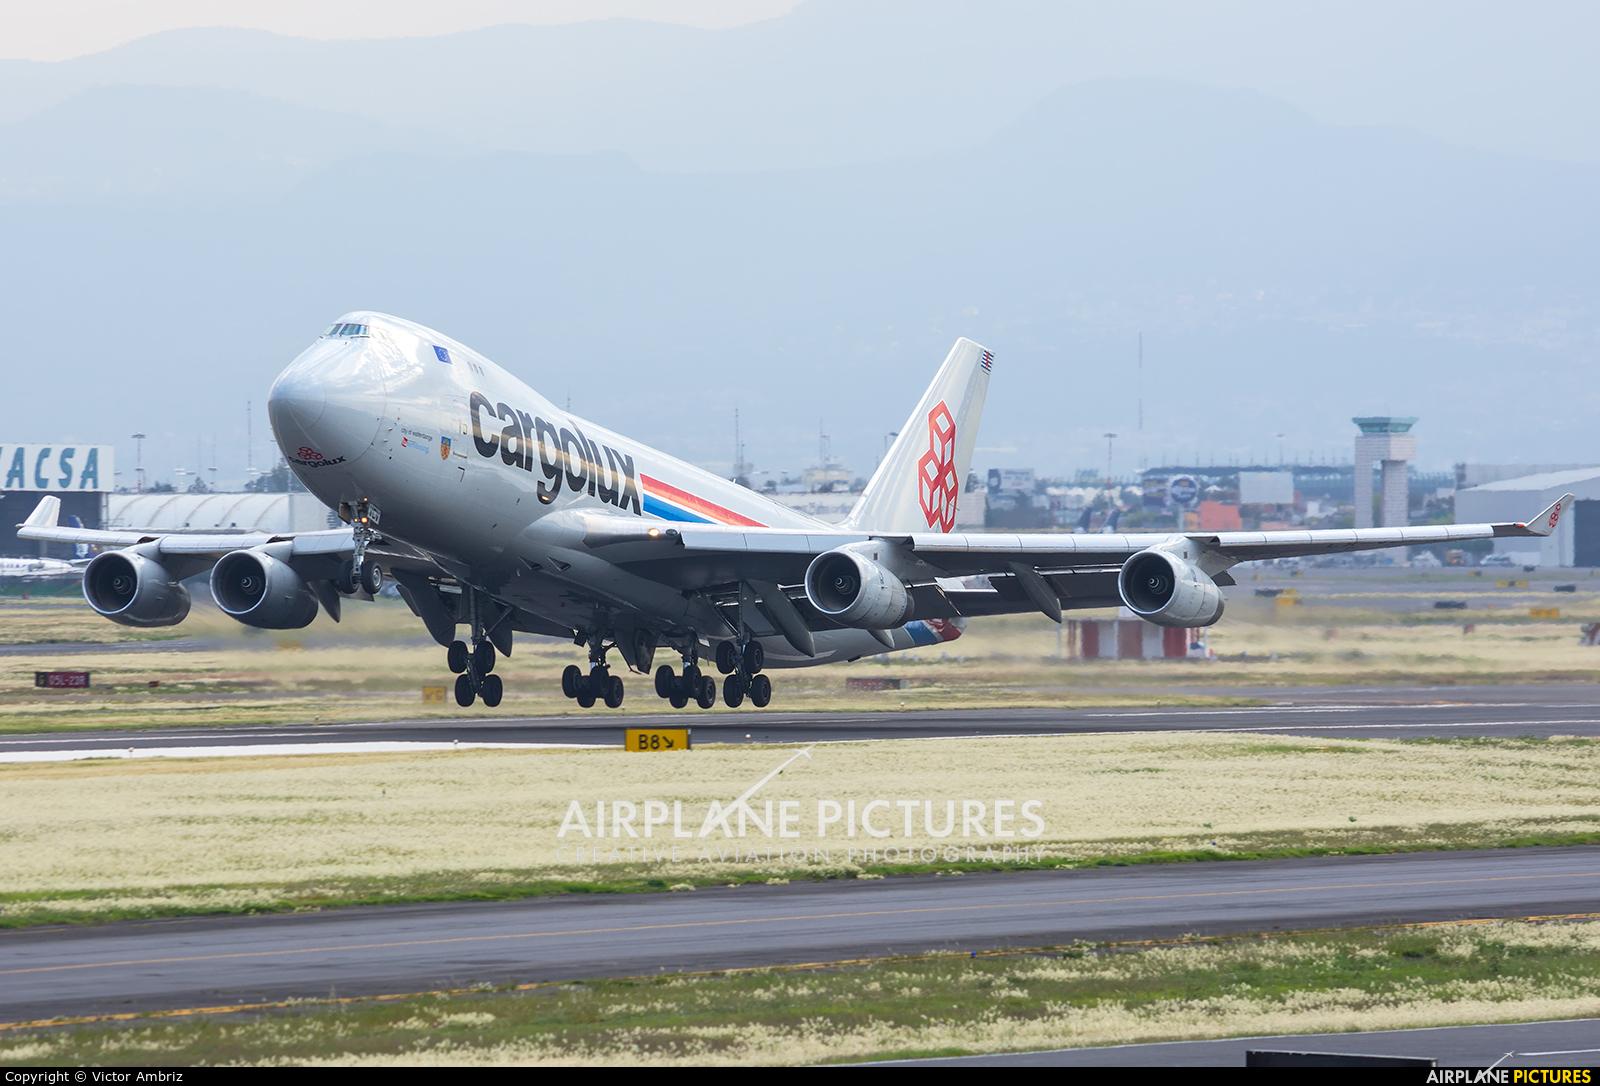 Cargolux LX-VCV aircraft at Mexico City - Licenciado Benito Juarez Intl